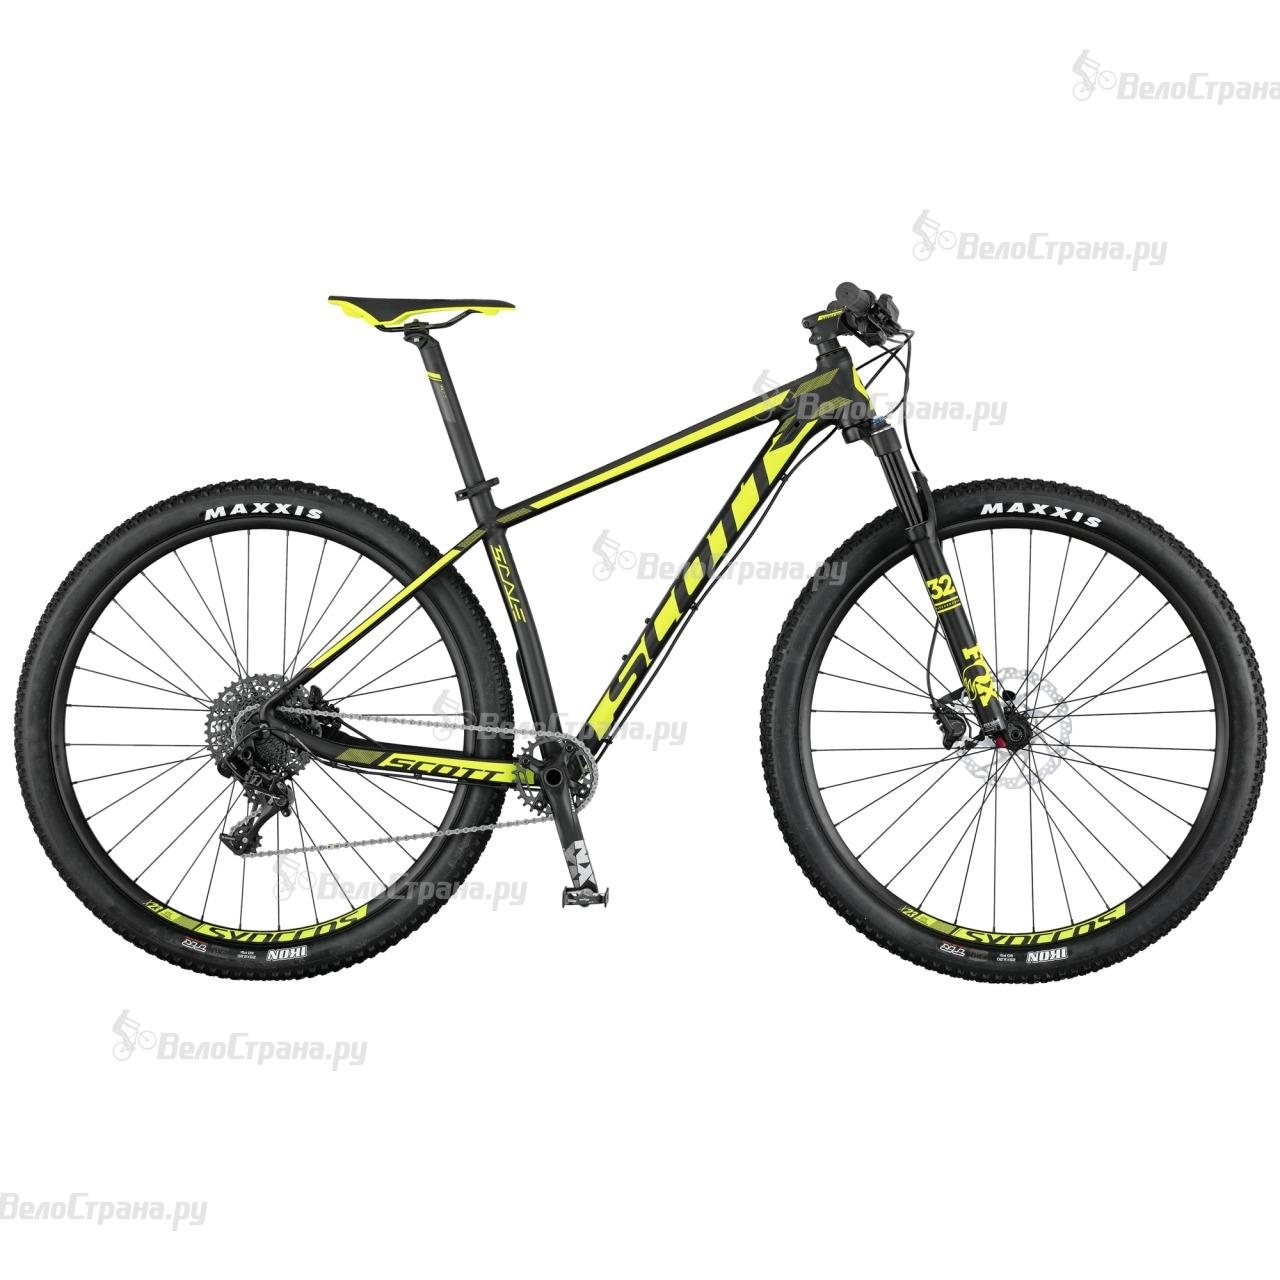 Велосипед Scott Scale 945 (2017) устройство delta эса 900а 3